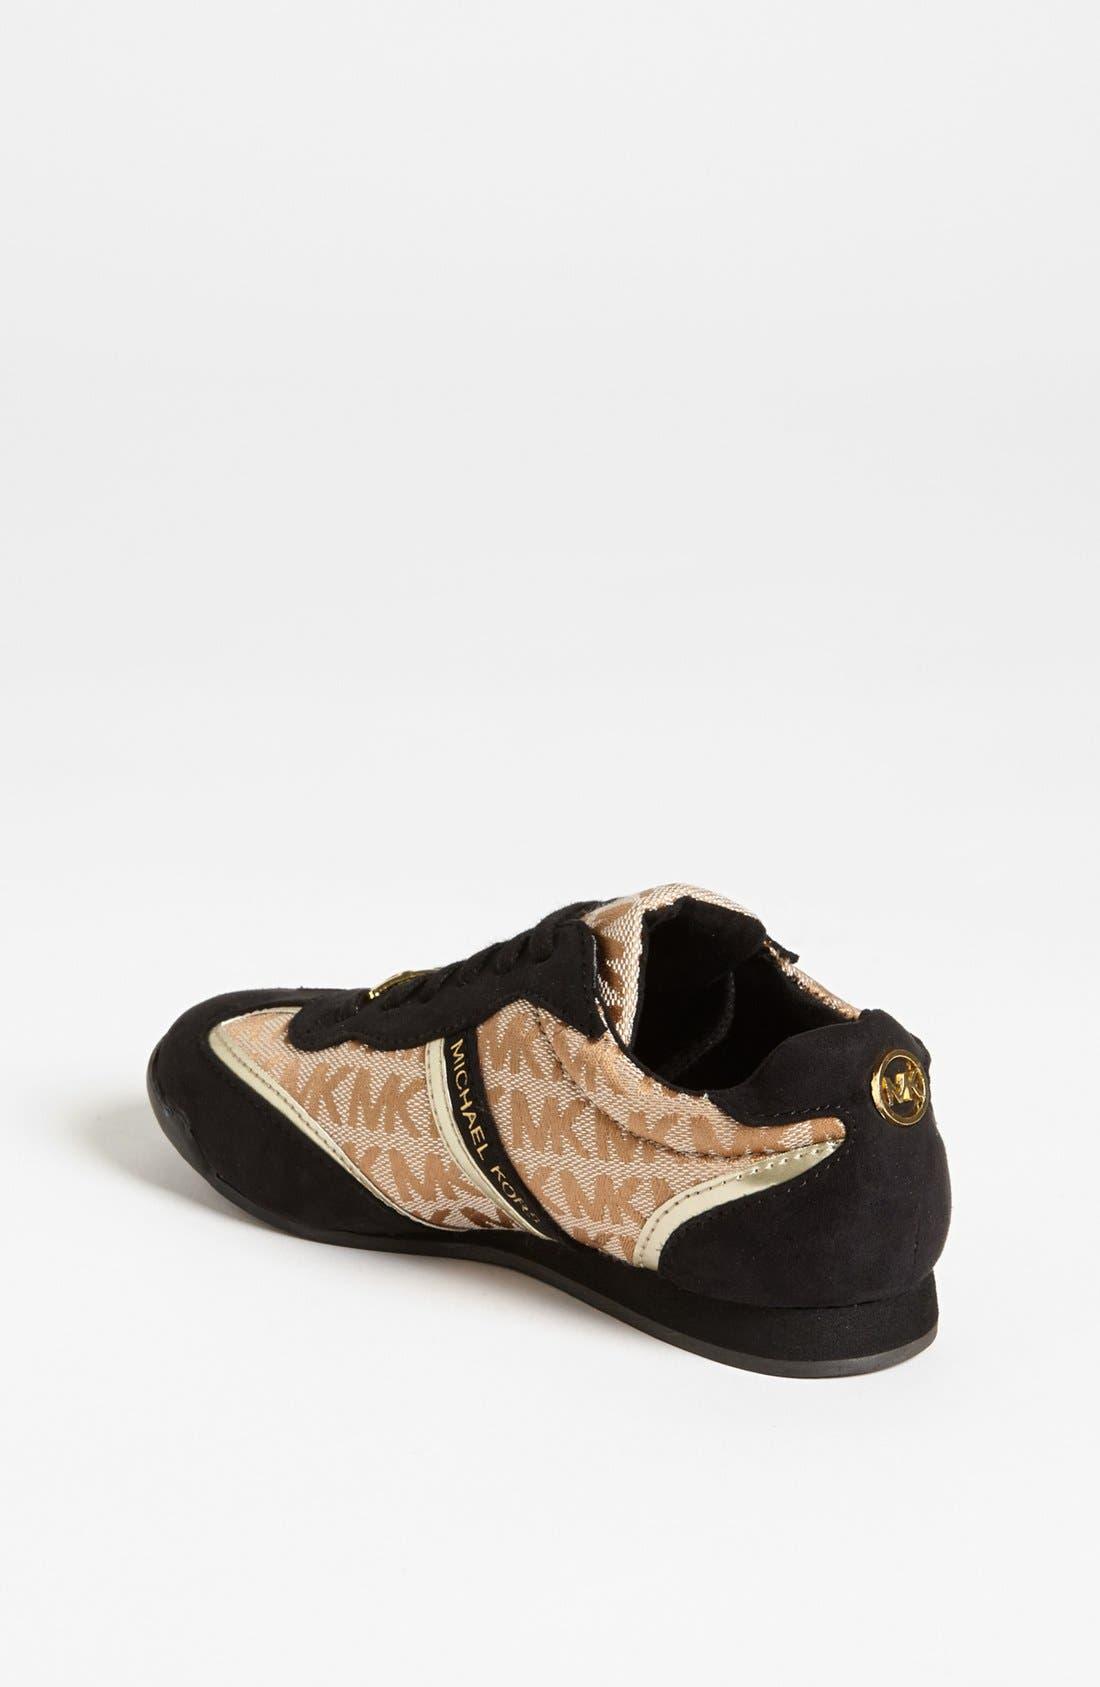 Alternate Image 2  - MICHAEL Michael Kors 'Sporty' Sneaker (Toddler, Little Kid & Big Kid)